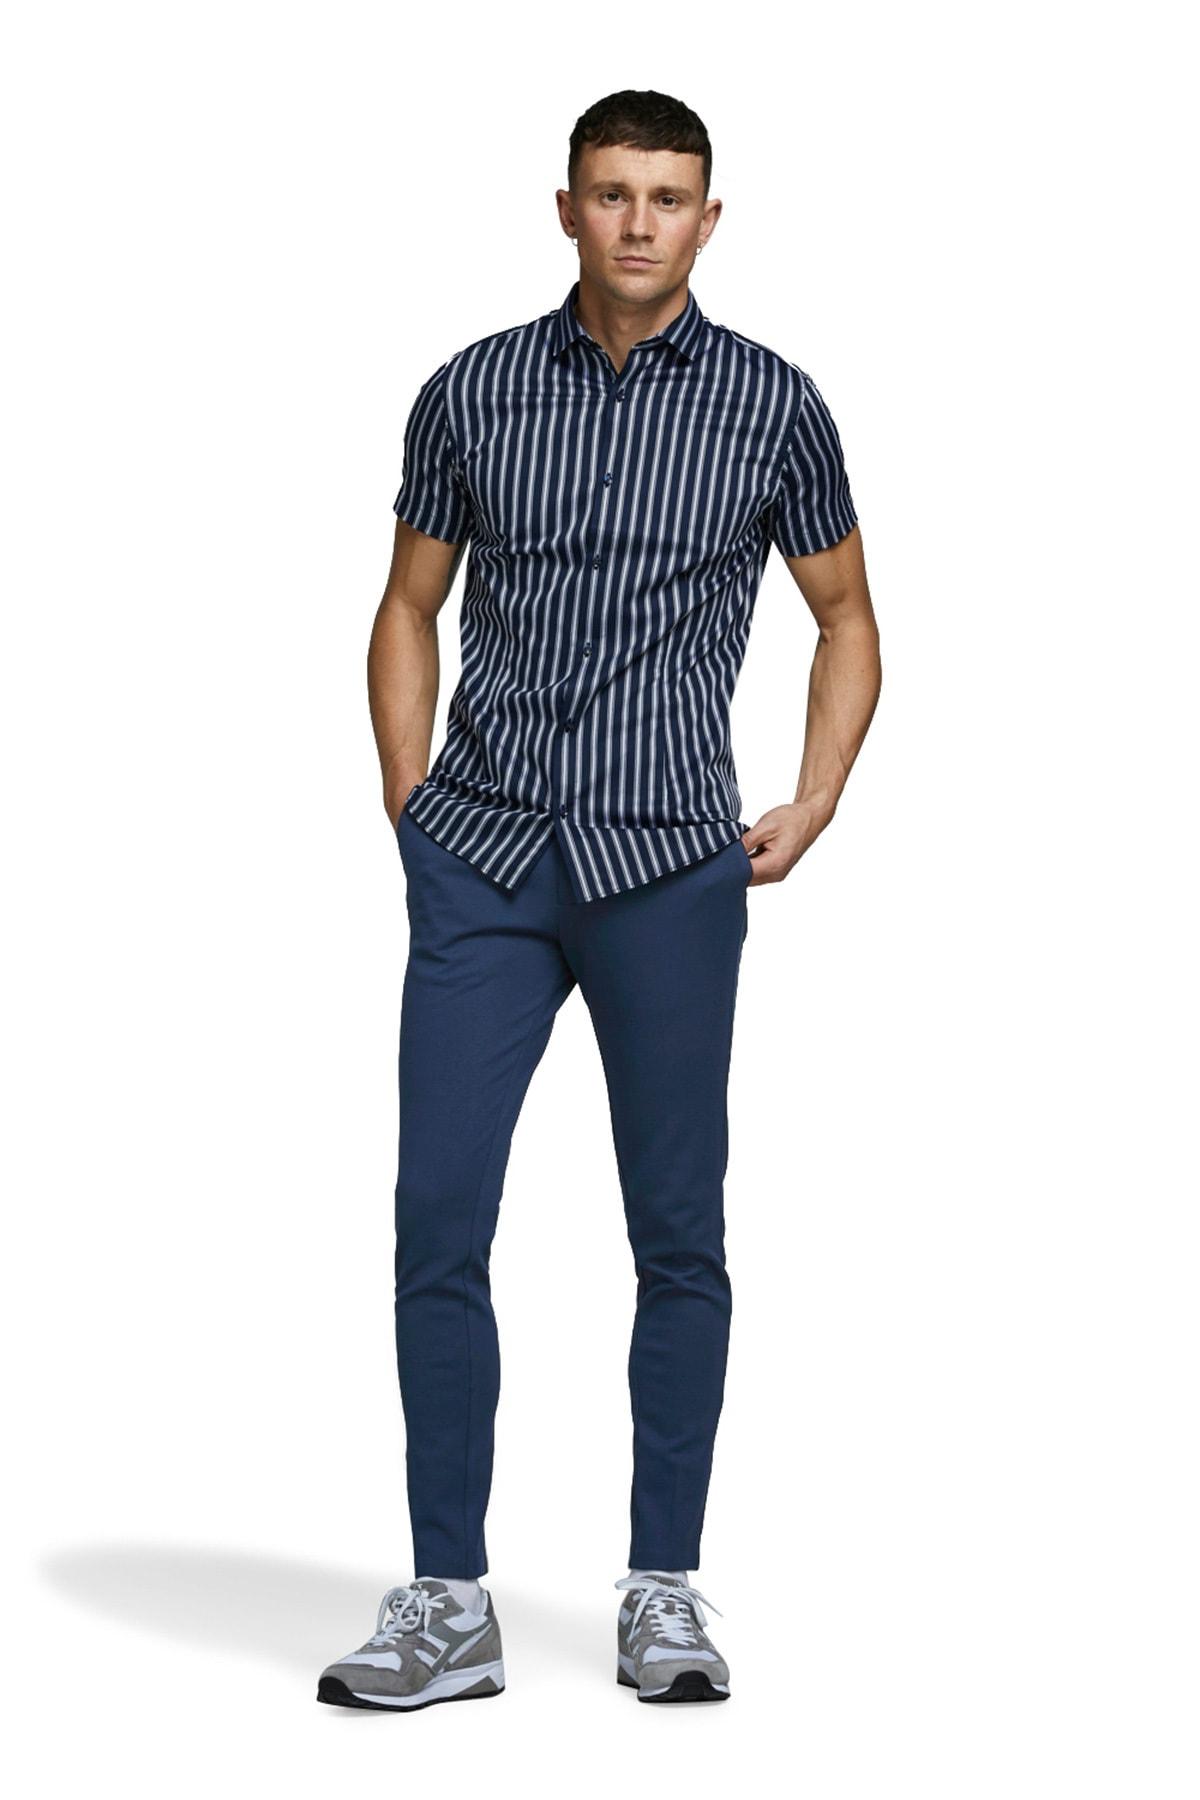 Jack & Jones Jeans Intelligence Jjımarco Slim Fit Pantolon ERKEK PANTOLON 12173630 1